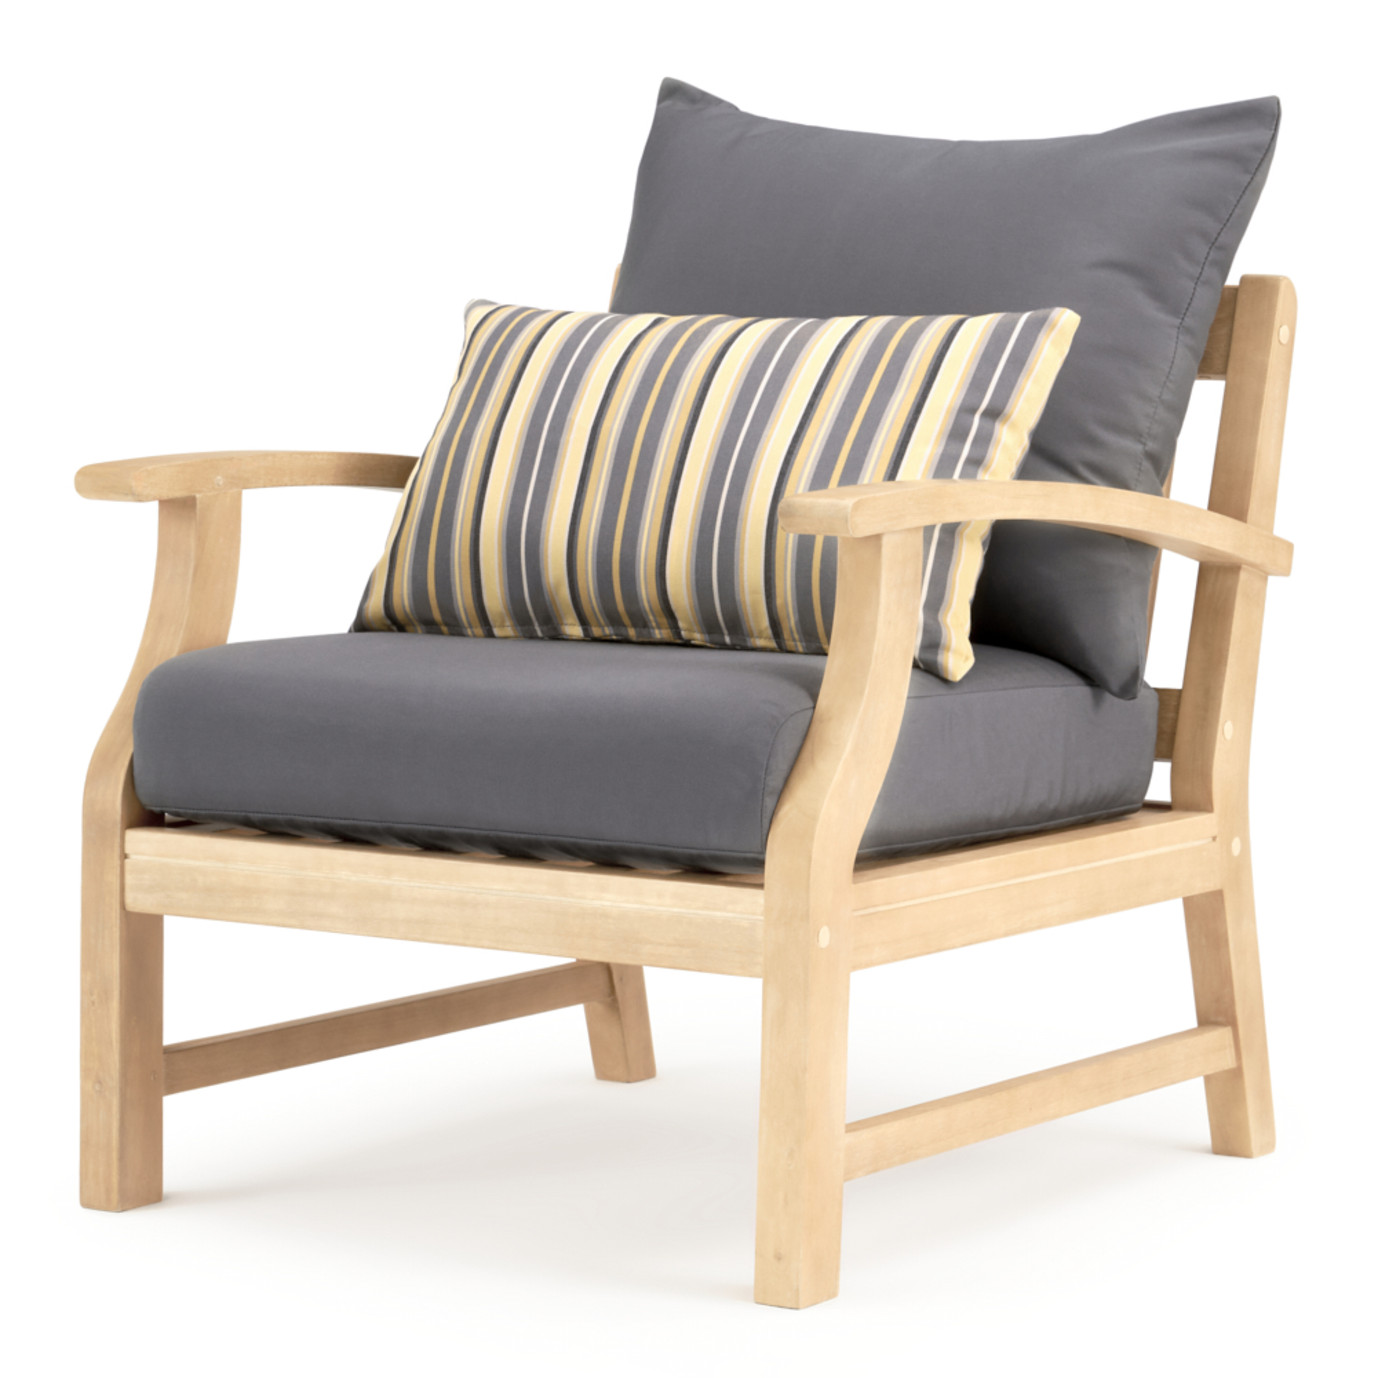 Kooper Club Chairs - Charcoal Gray